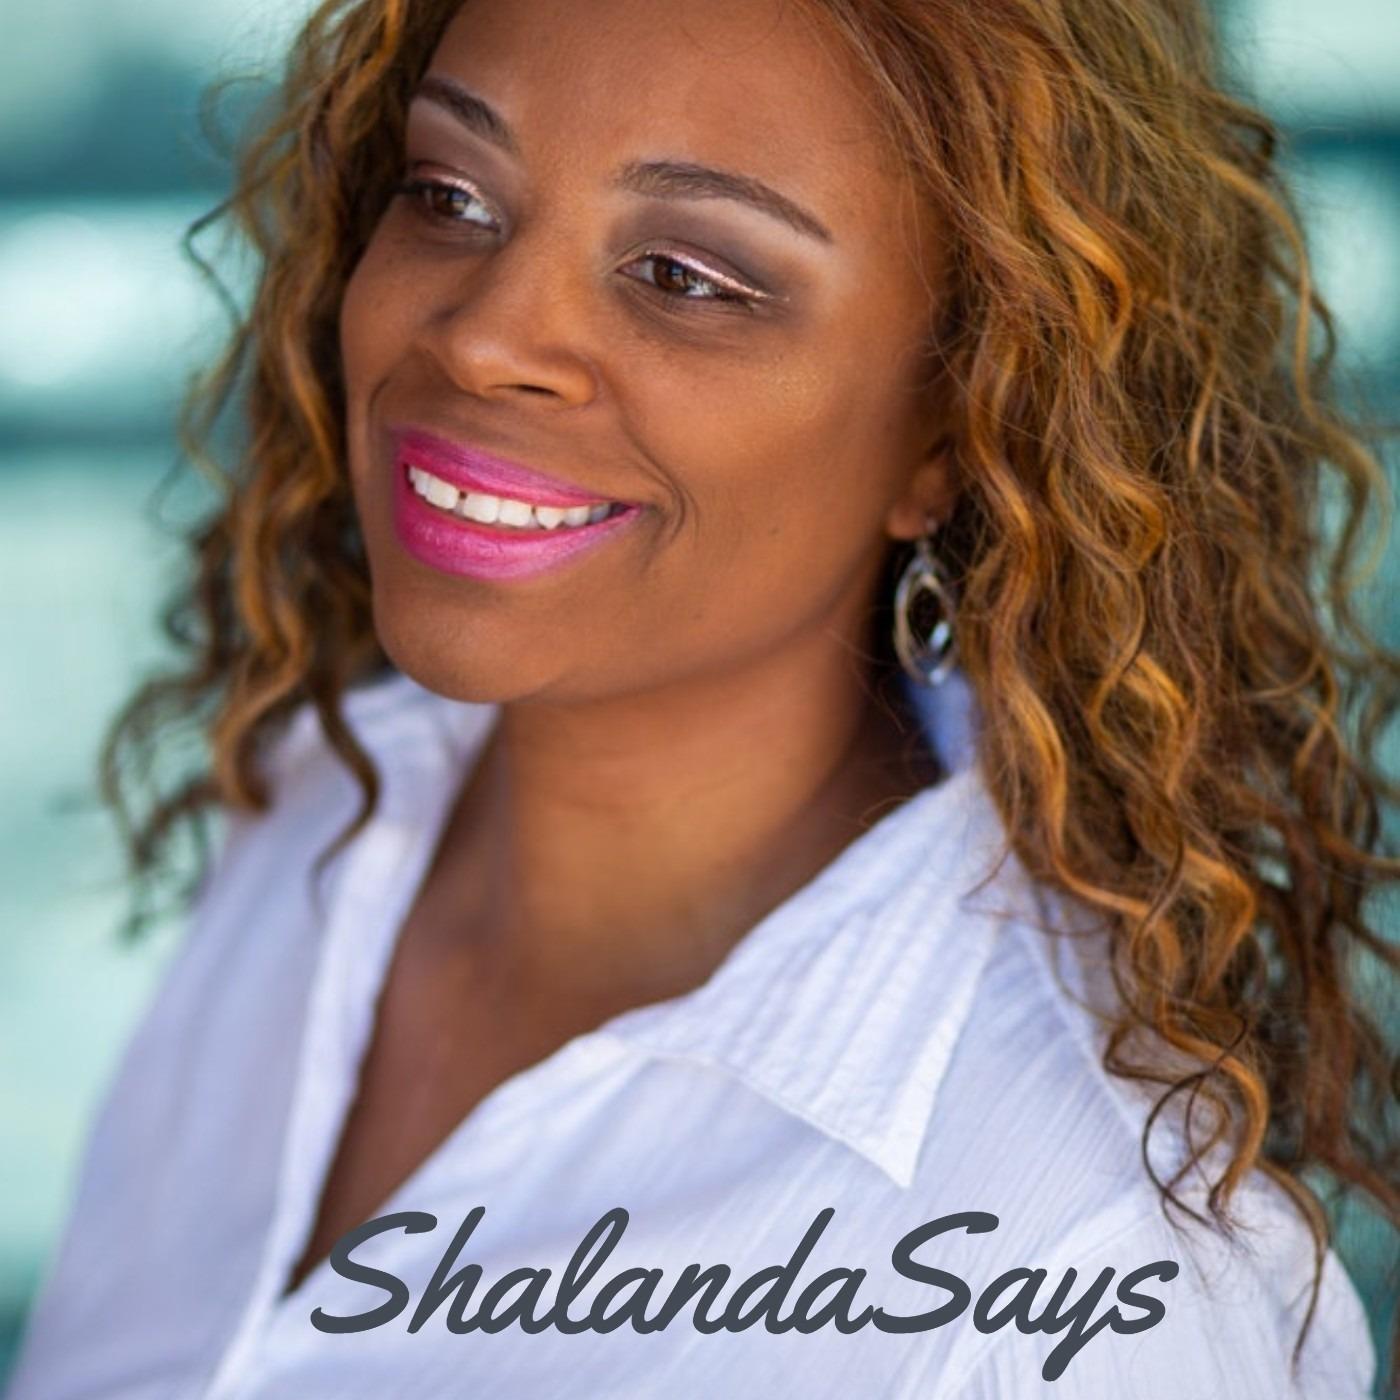 ShalandaSays Meet Coach Kay Sanders